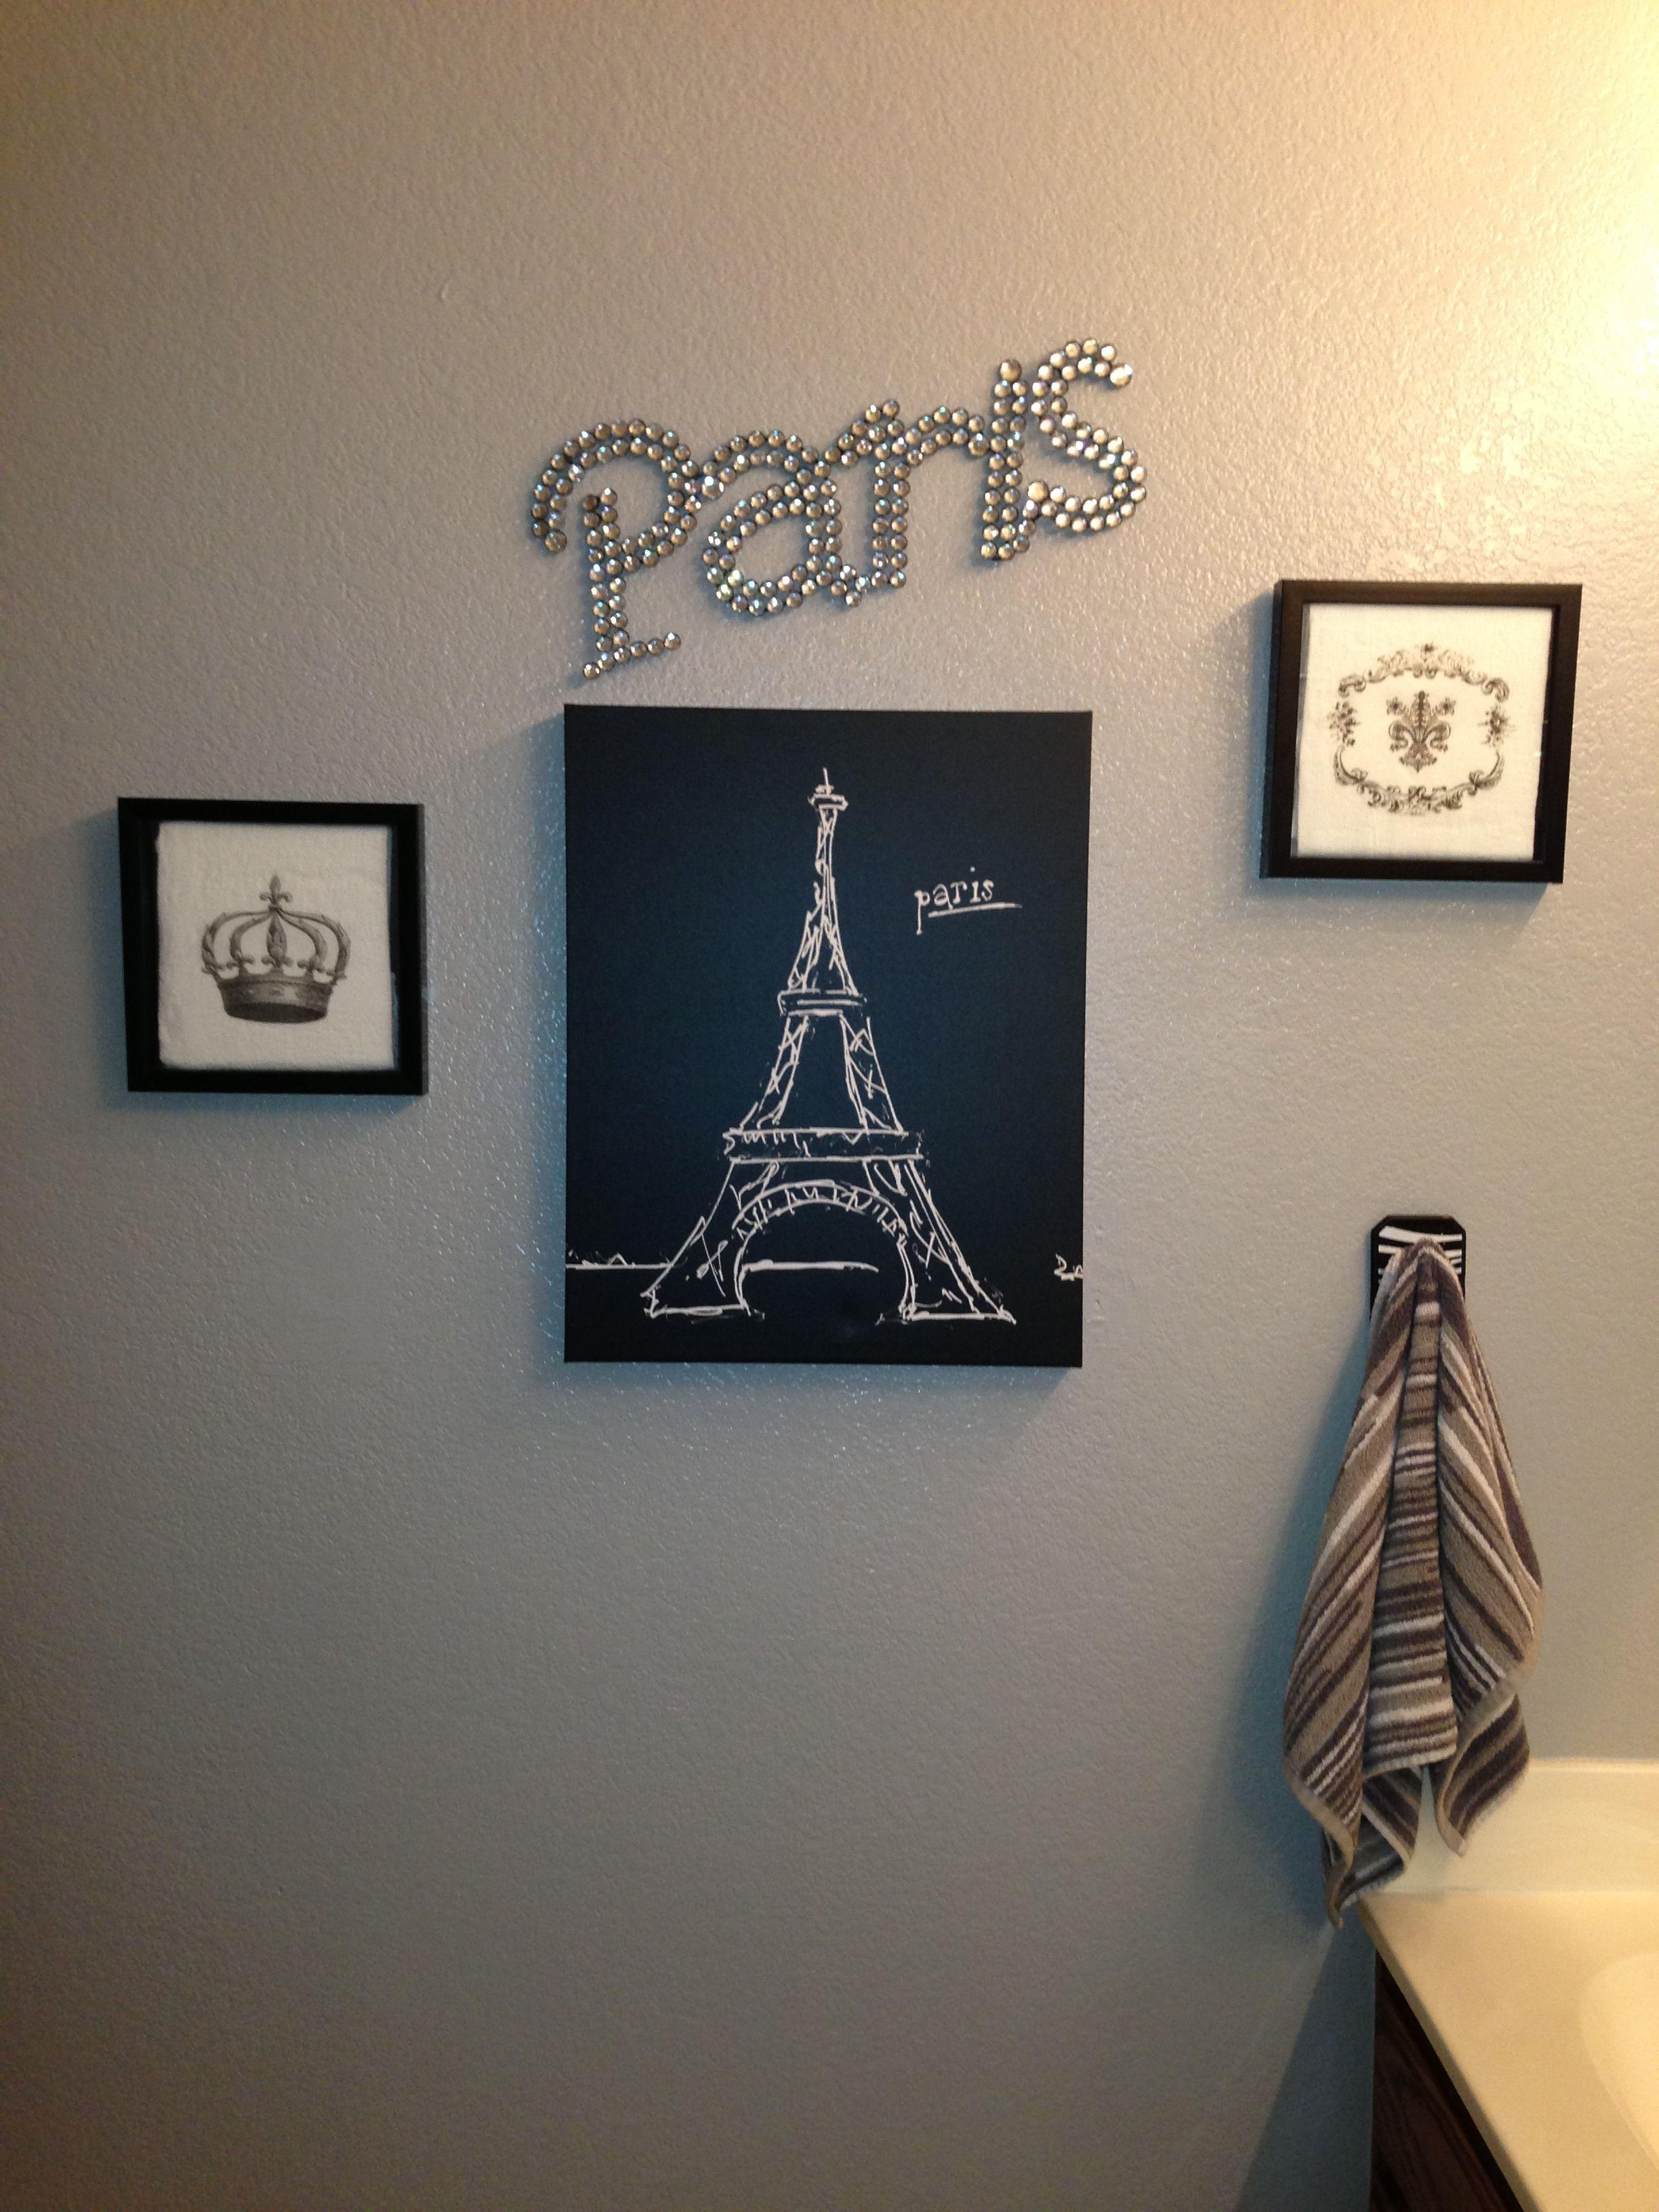 Paris Bathroom Decor Girls Paris Theme Bathroom These R From Bed Bath And Beyond